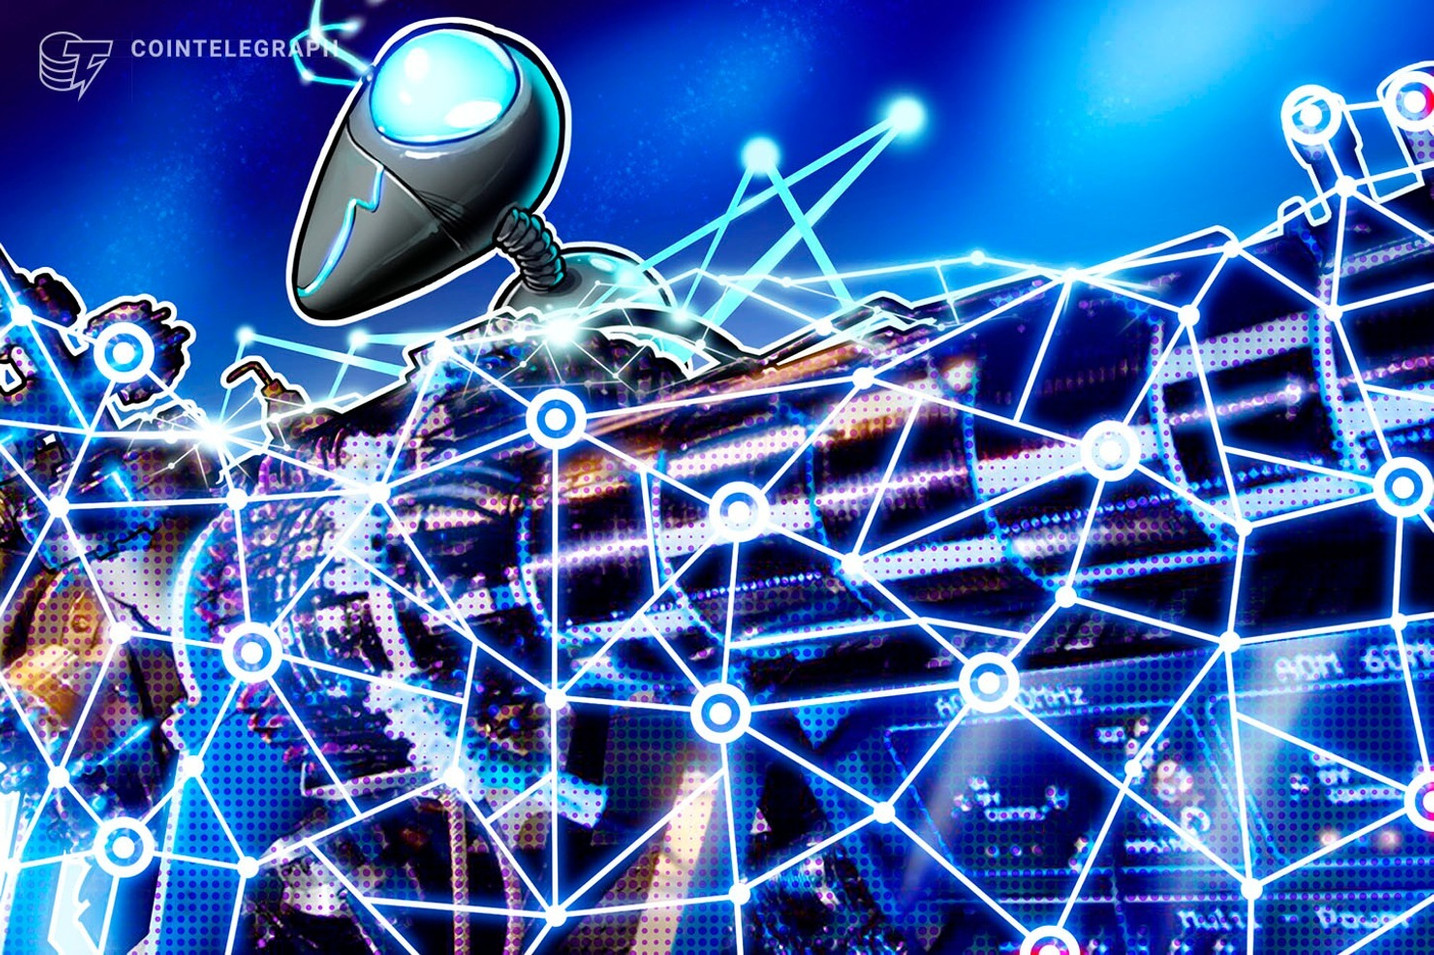 AWSが量子コンピューター・サービス「Braket」を発表|3社の量子ハードにアクセス可能に【ニュース】